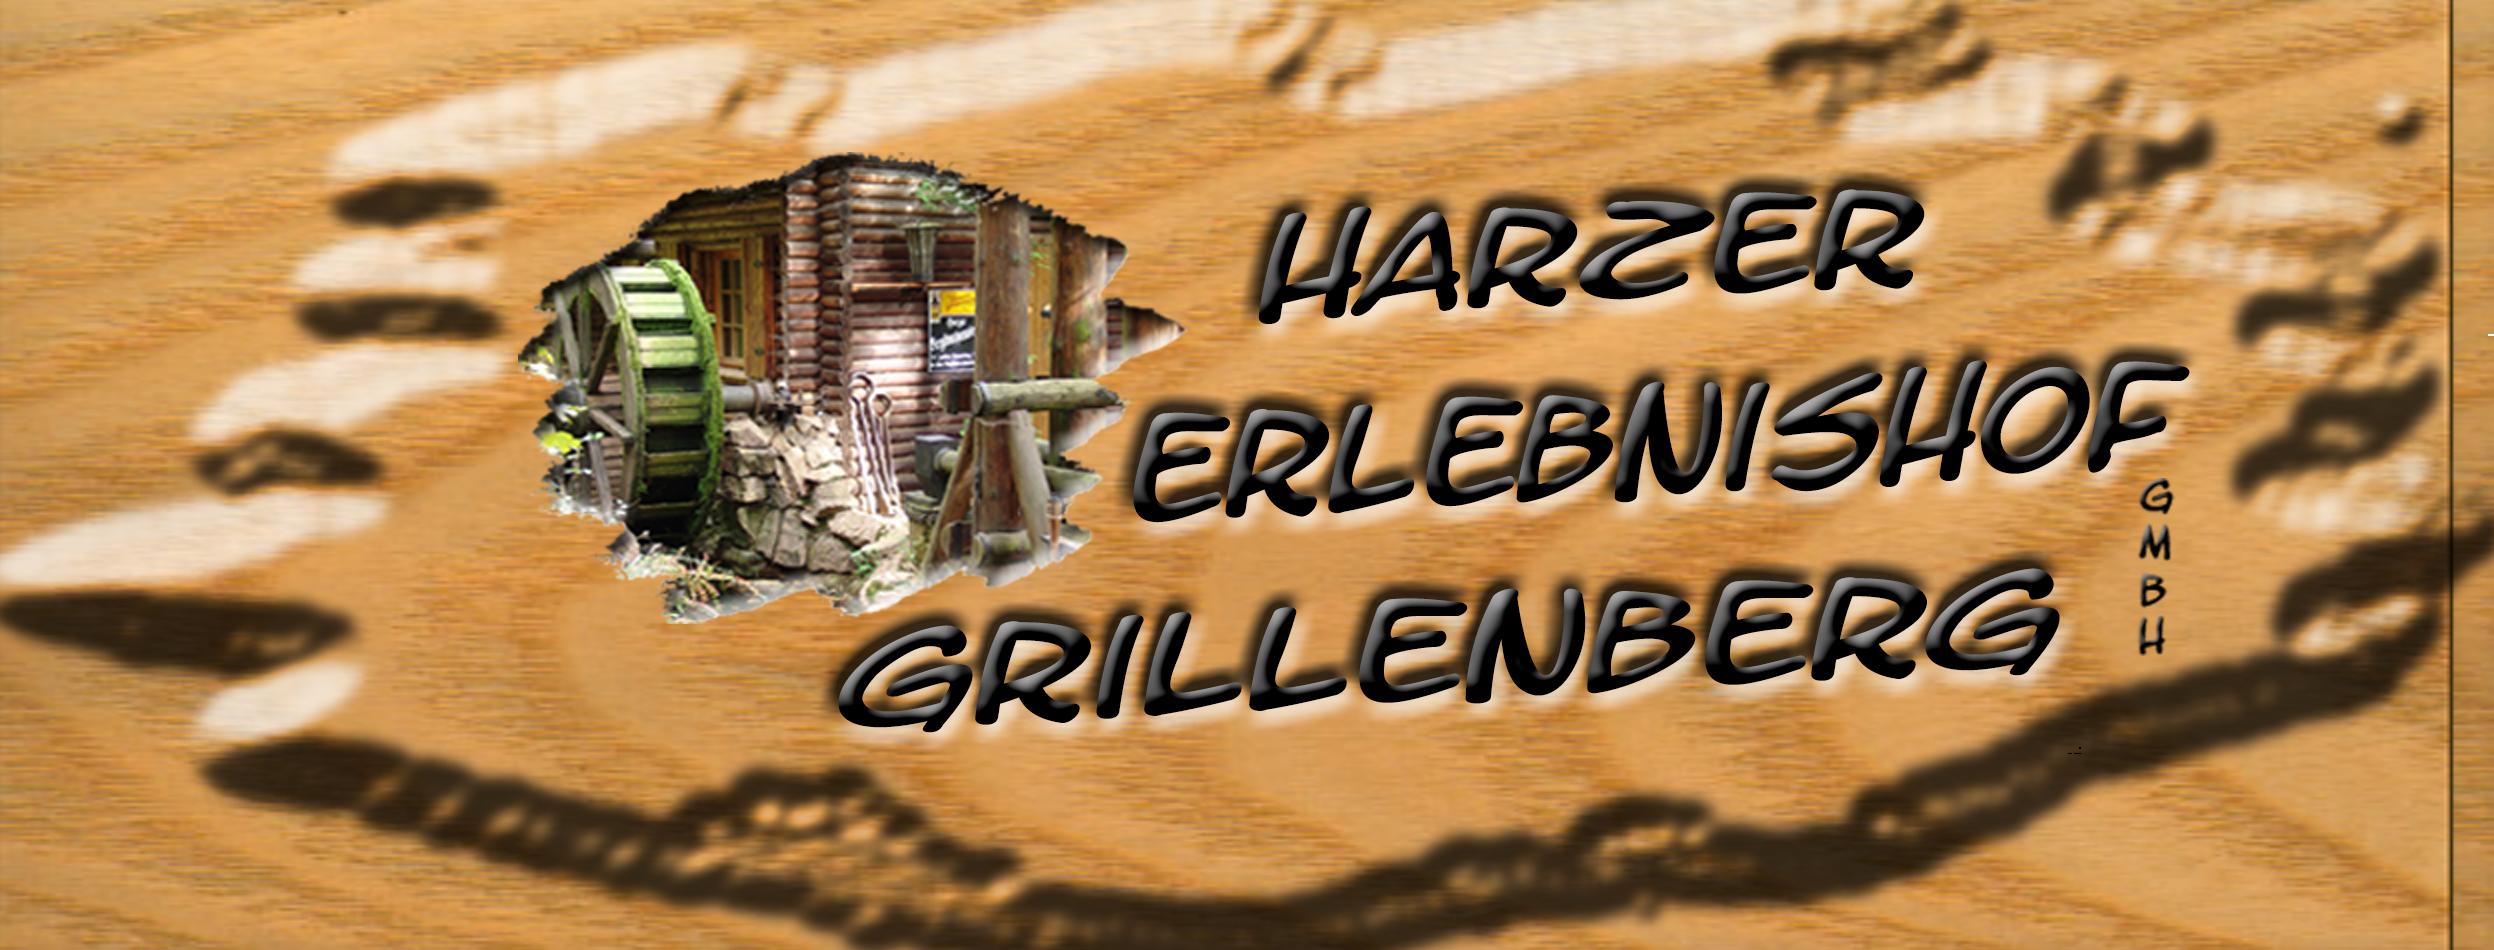 Harzer Erlebnishof